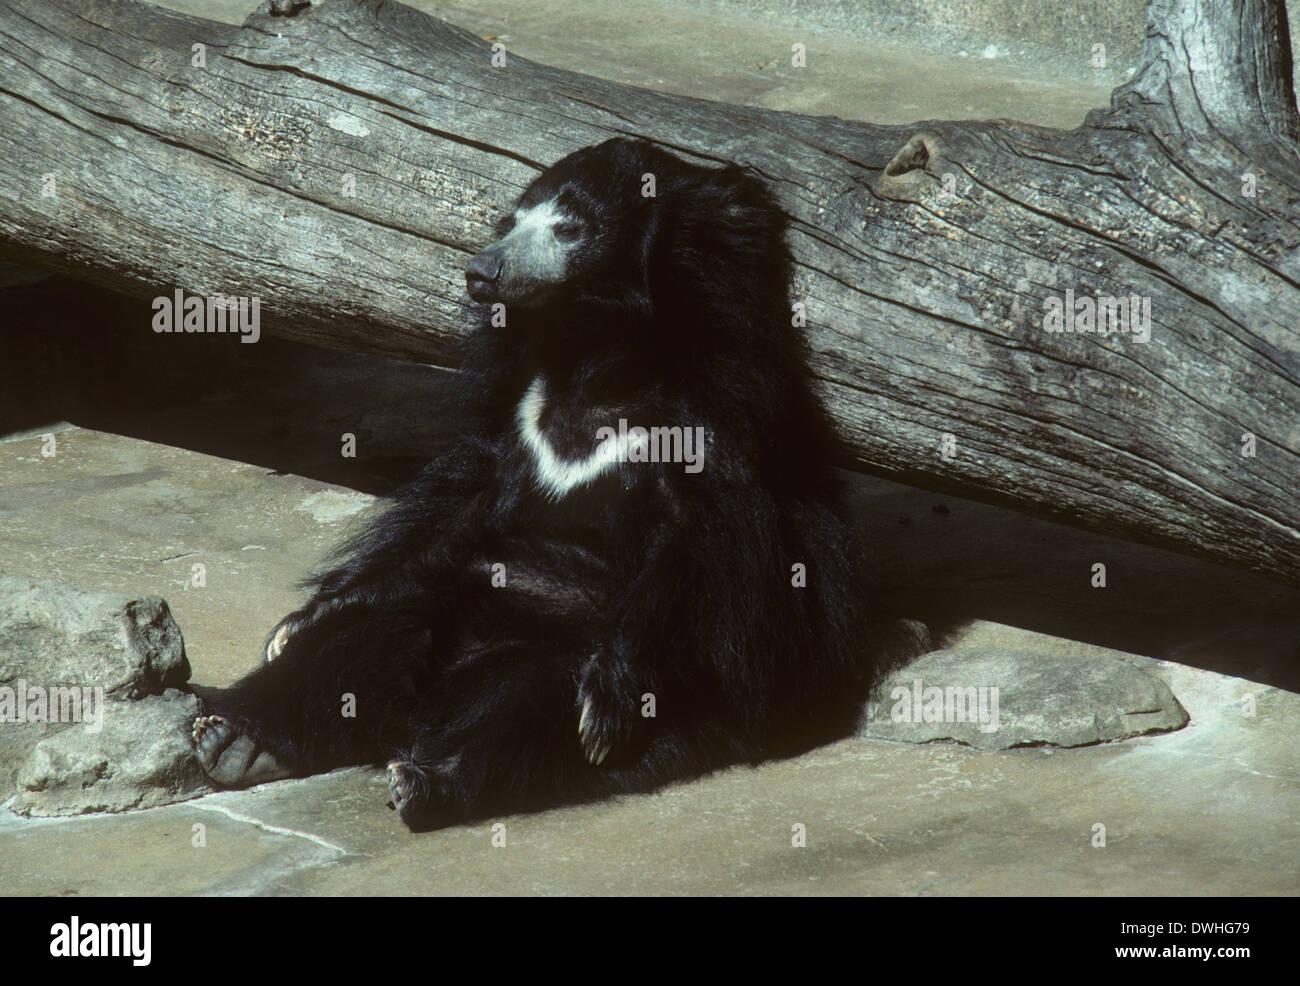 Ceylonese sloth bear, San Diego Zoo., San Diego, California, USA Stock Photo